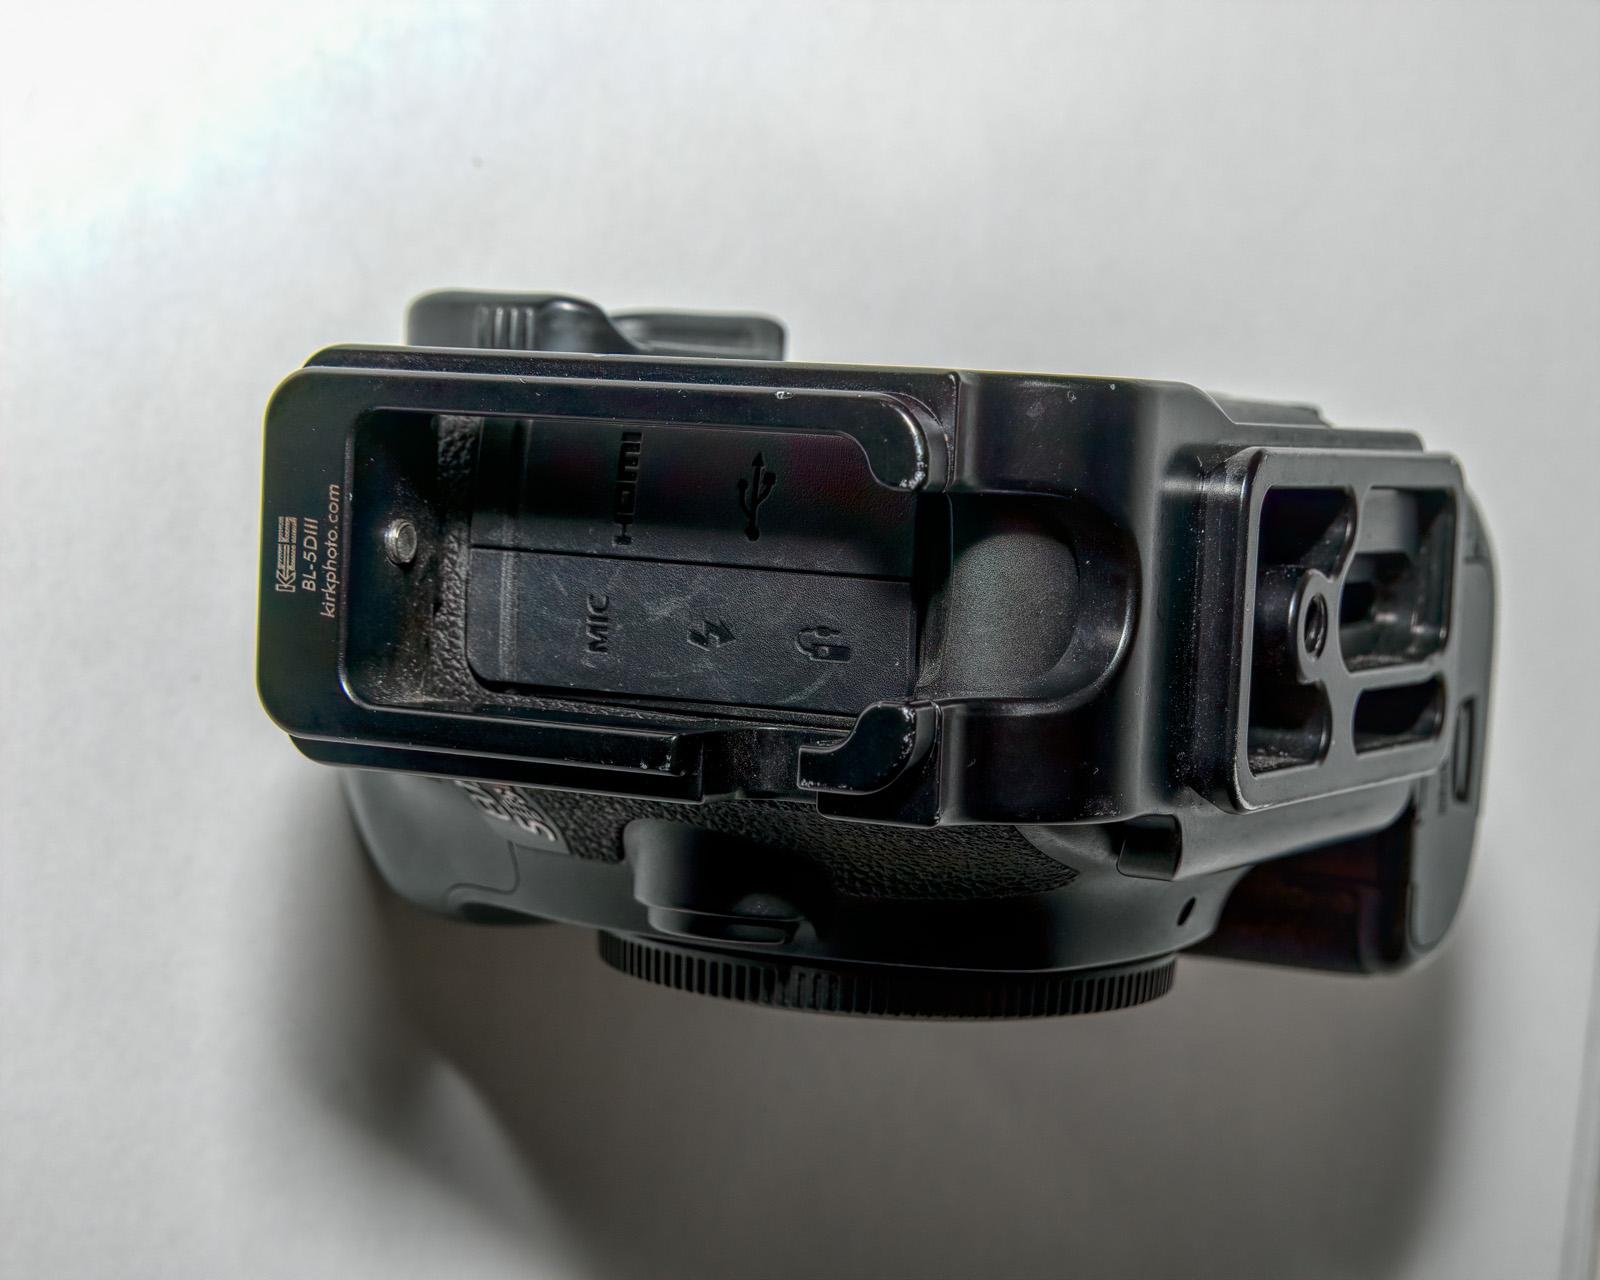 201210-551-R5.jpg